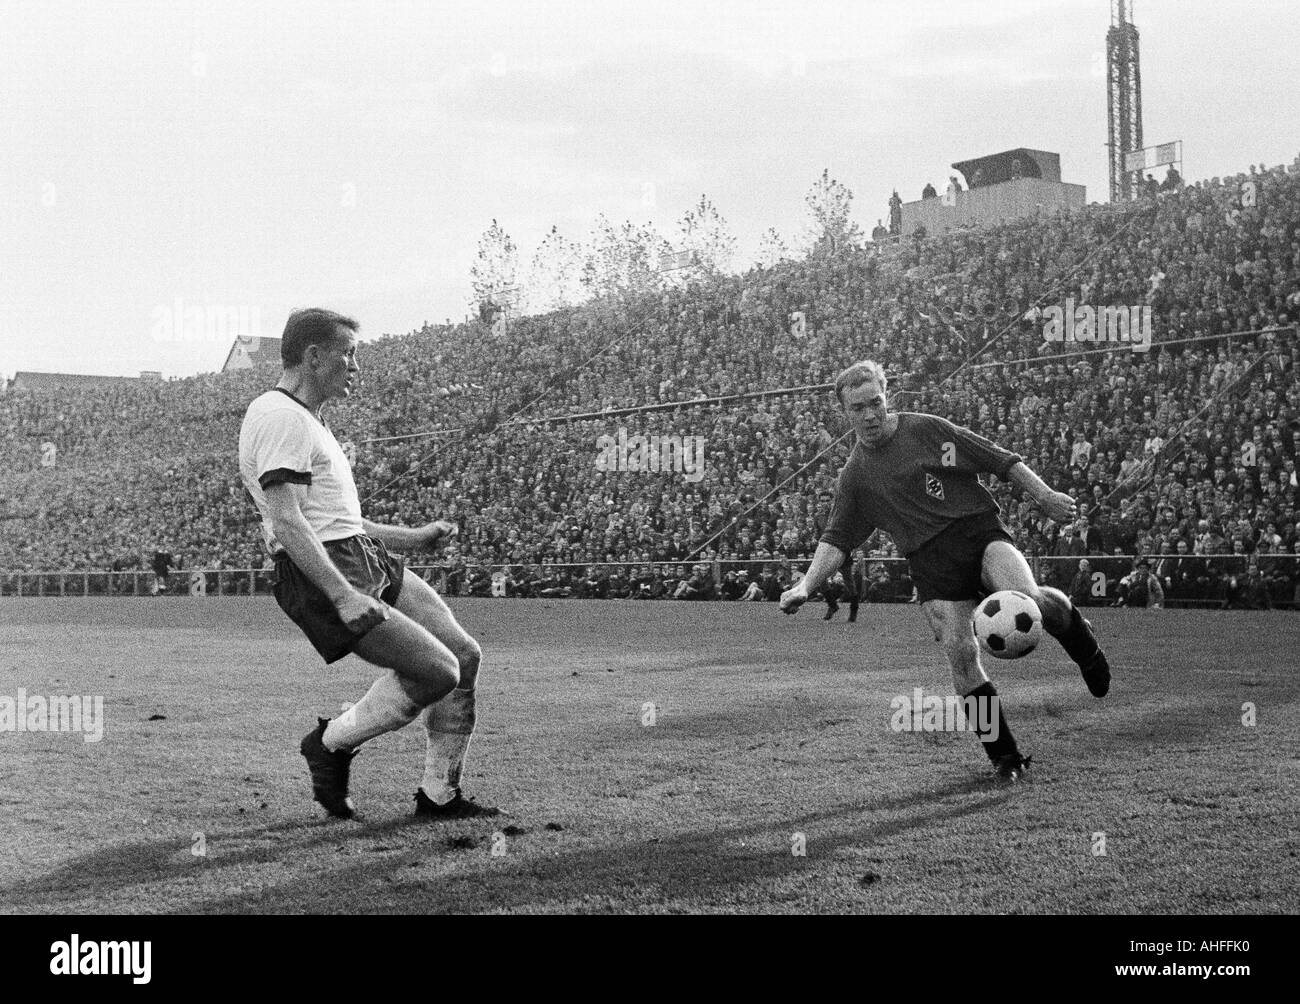 football, Bundesliga, 1965/1966, Borussia Moenchengladbach versus FC Bayern Munich 1:2, Boekelberg Stadium, scene of the match, left Werner Olk (Munich), right Bernd Rupp (MG) - Stock Image